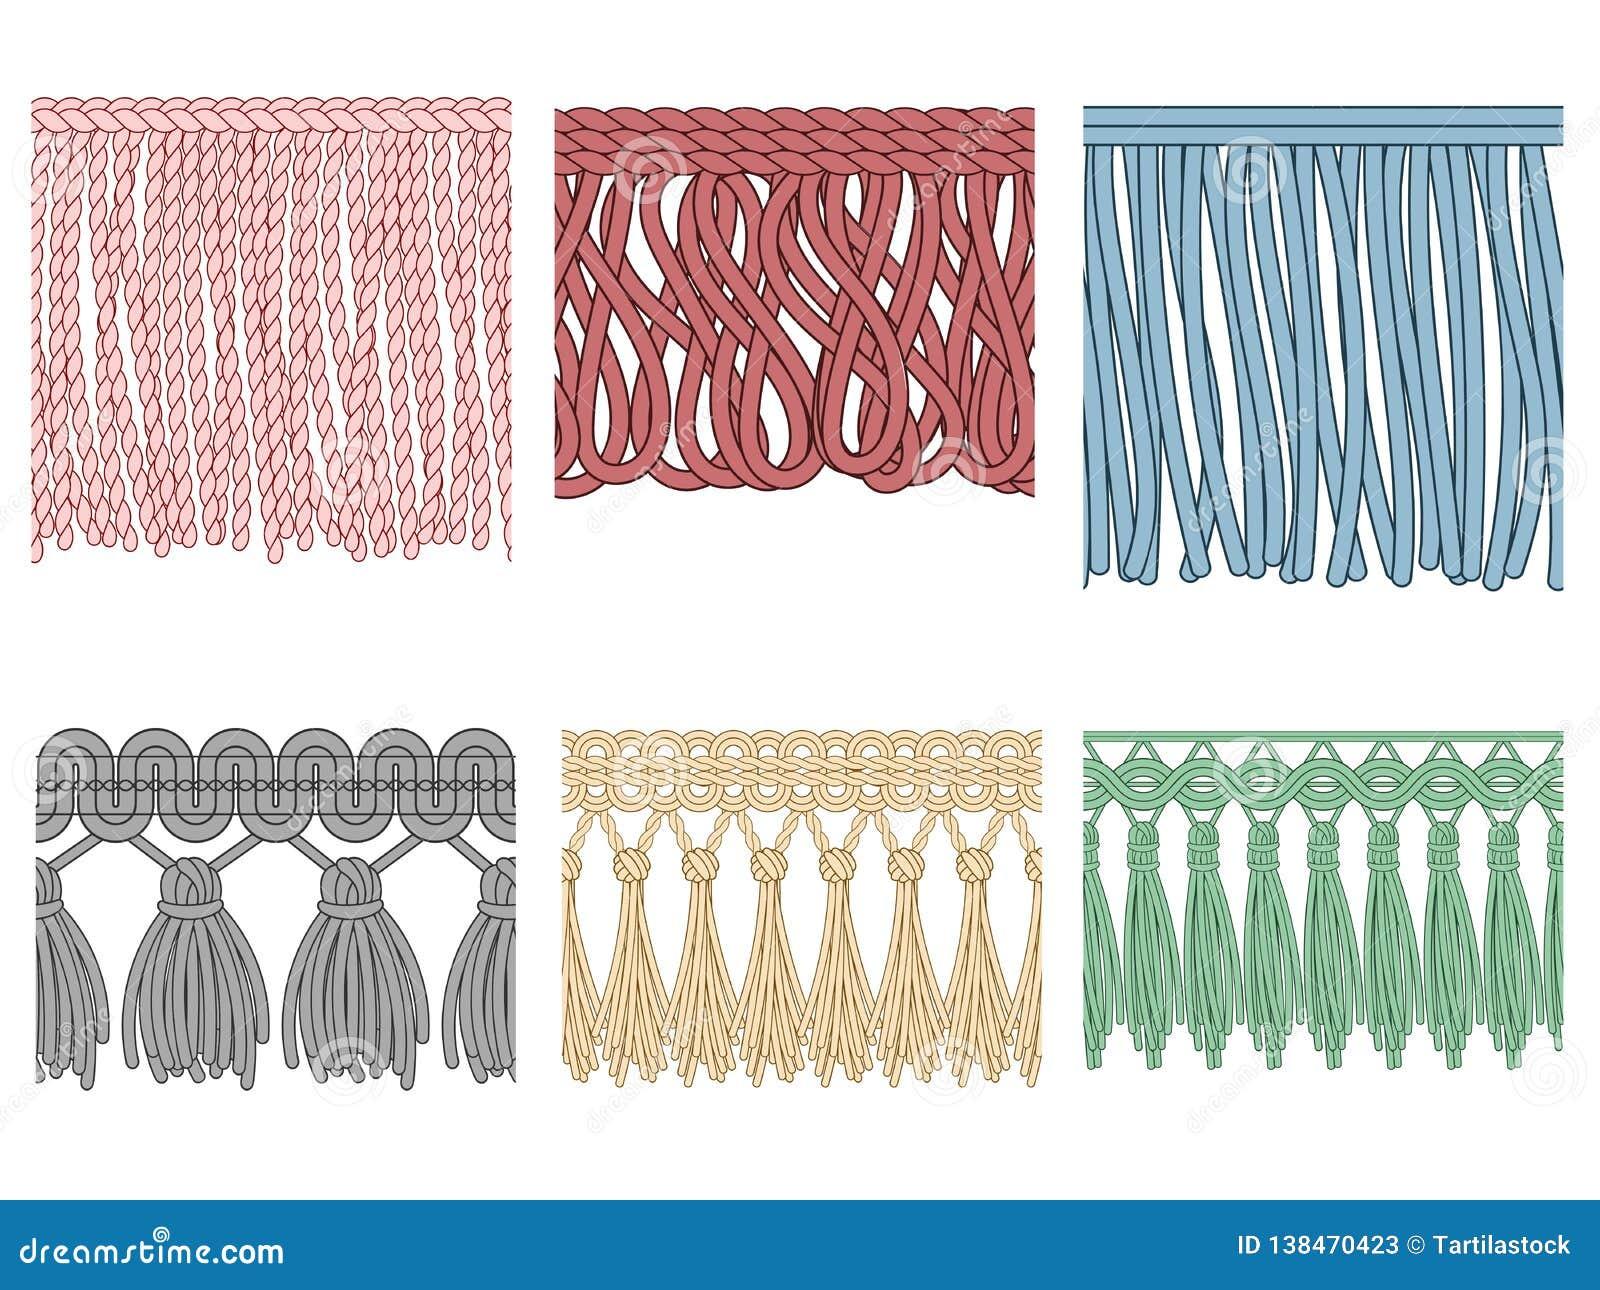 Garment Fringe Ruffle Seam Trim Raw Textile Edge And Tassel Braid